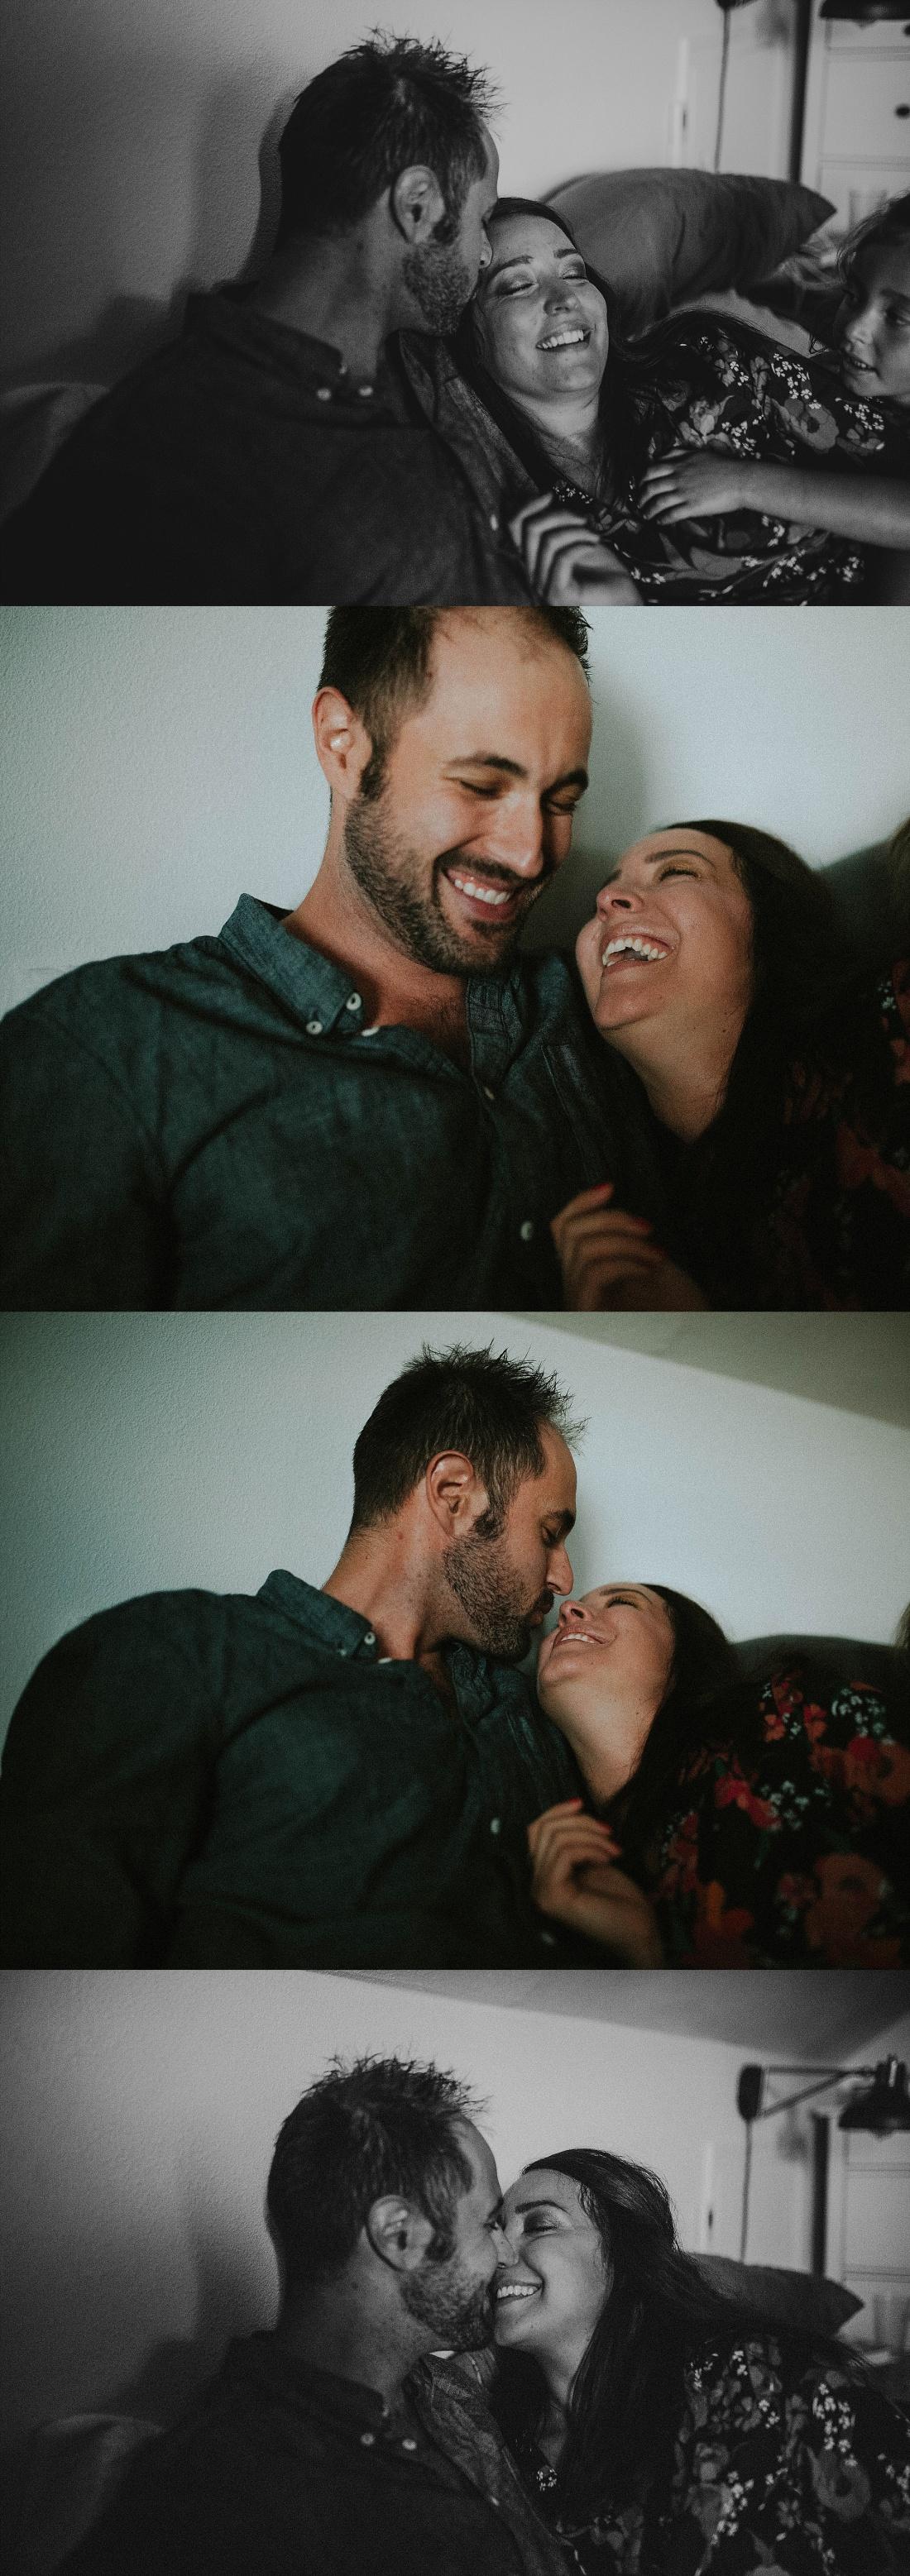 ADRI DELA CRUZ CHICAGO AND WEST SUBURBS FAMILY PHOTOGRAPHER (56)